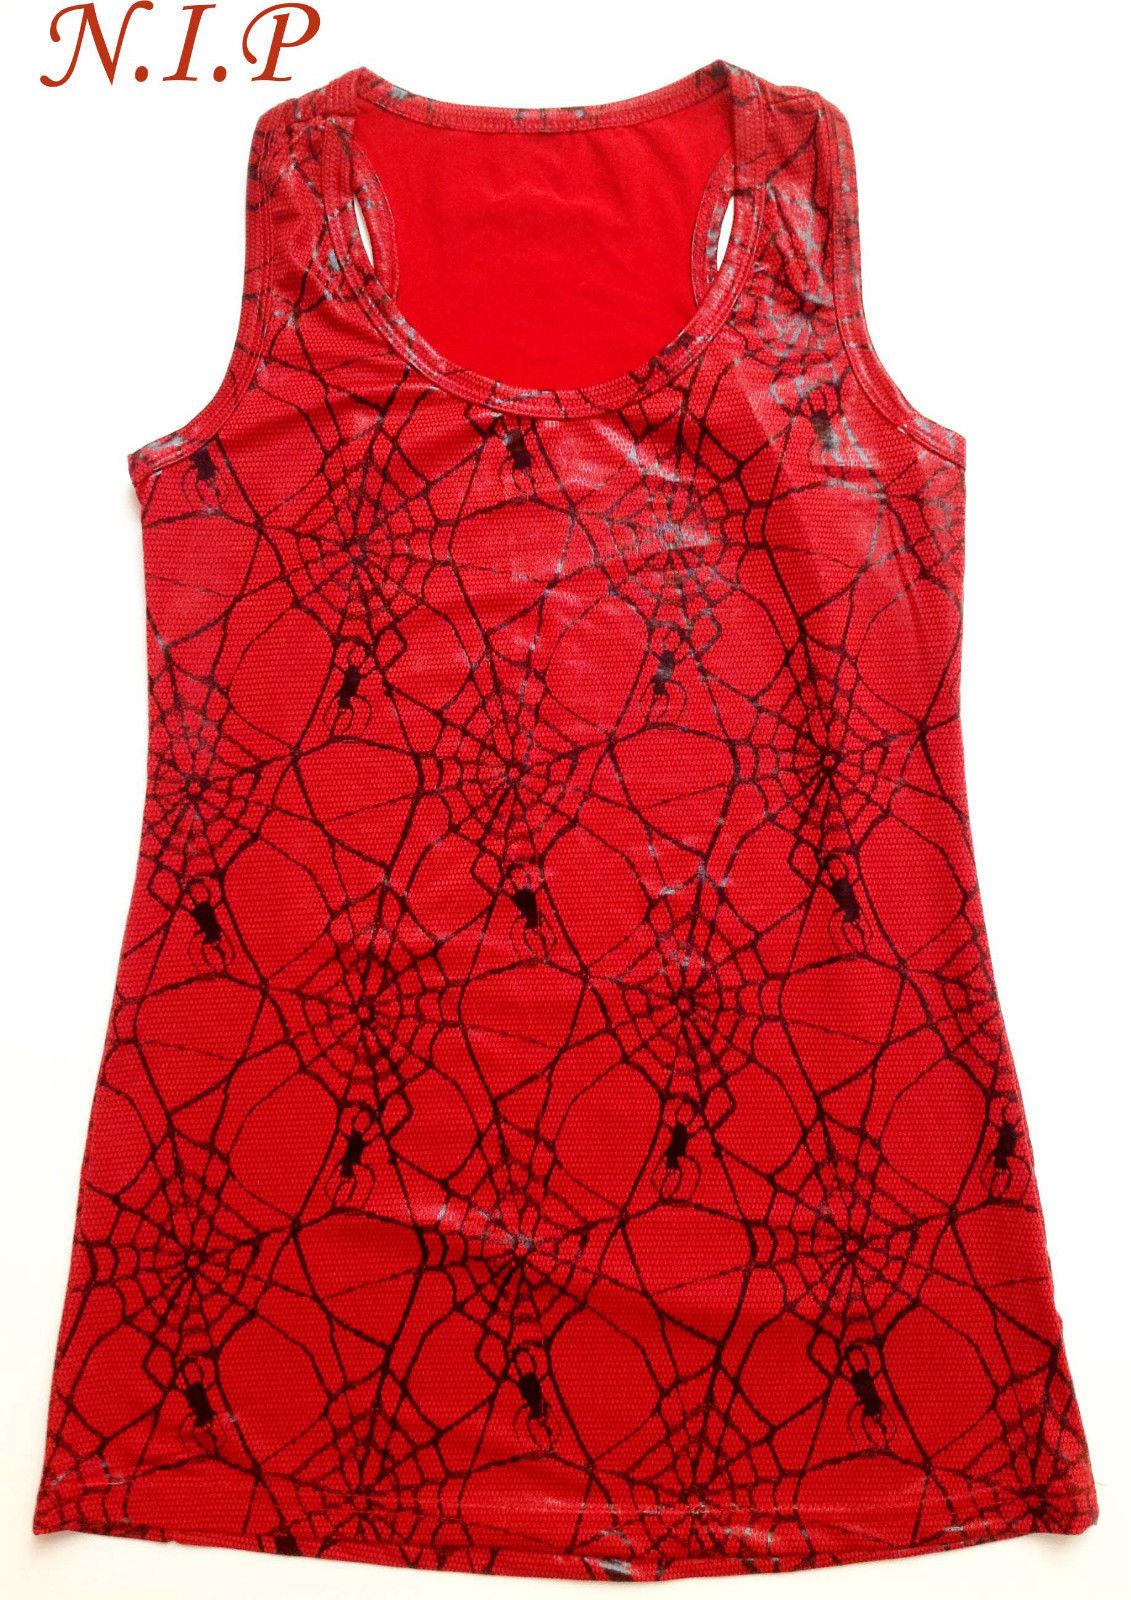 Red Spider Web Goth Punk Visual Kei Cyber Club wear Hot Topic Halloween Tank Top - $91.00